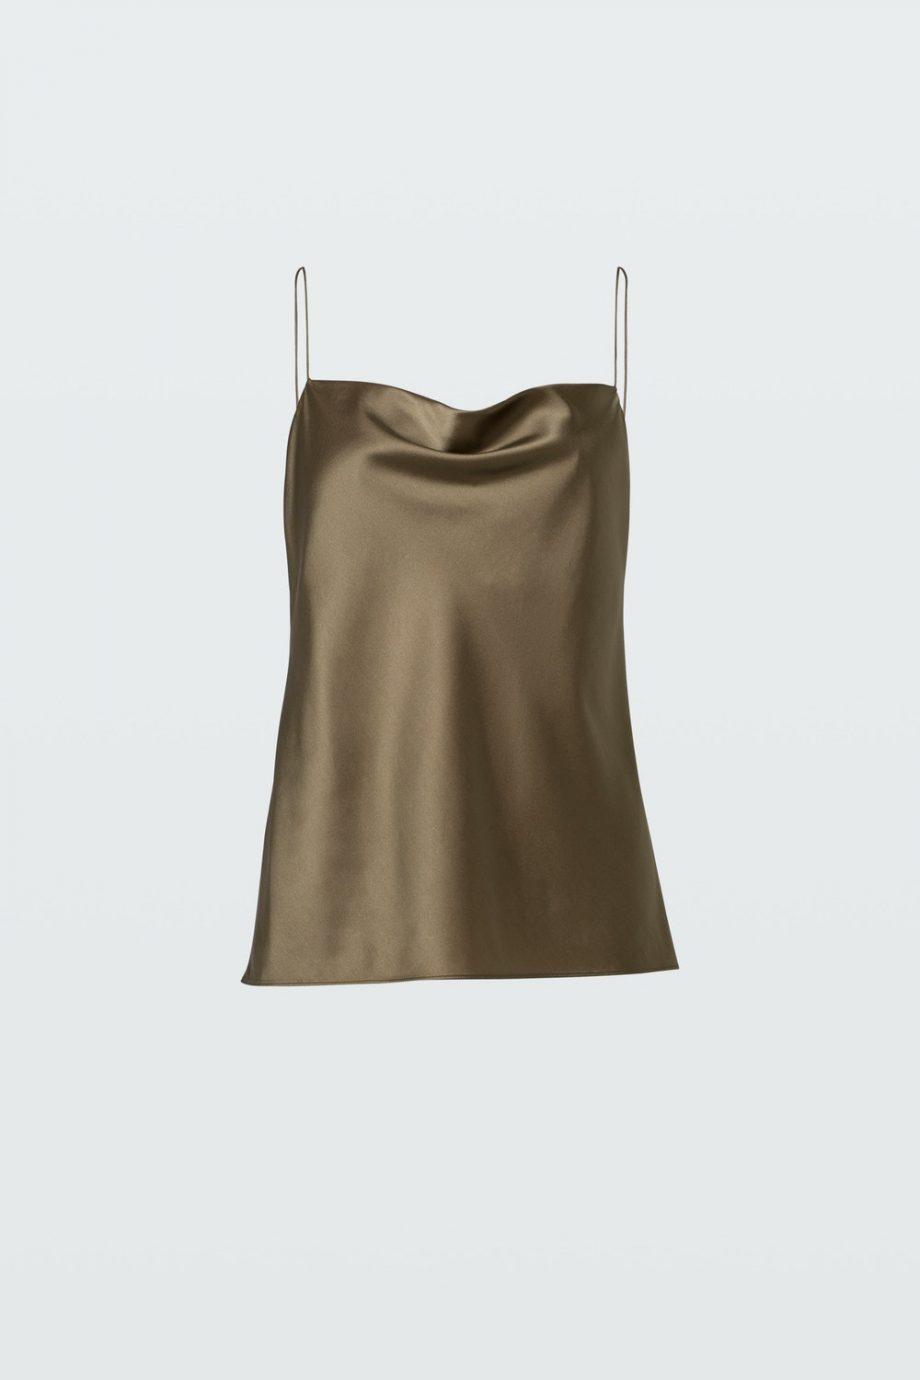 gruen-shirts-tops-dorothee-schumacher-202-847901-519-2-6